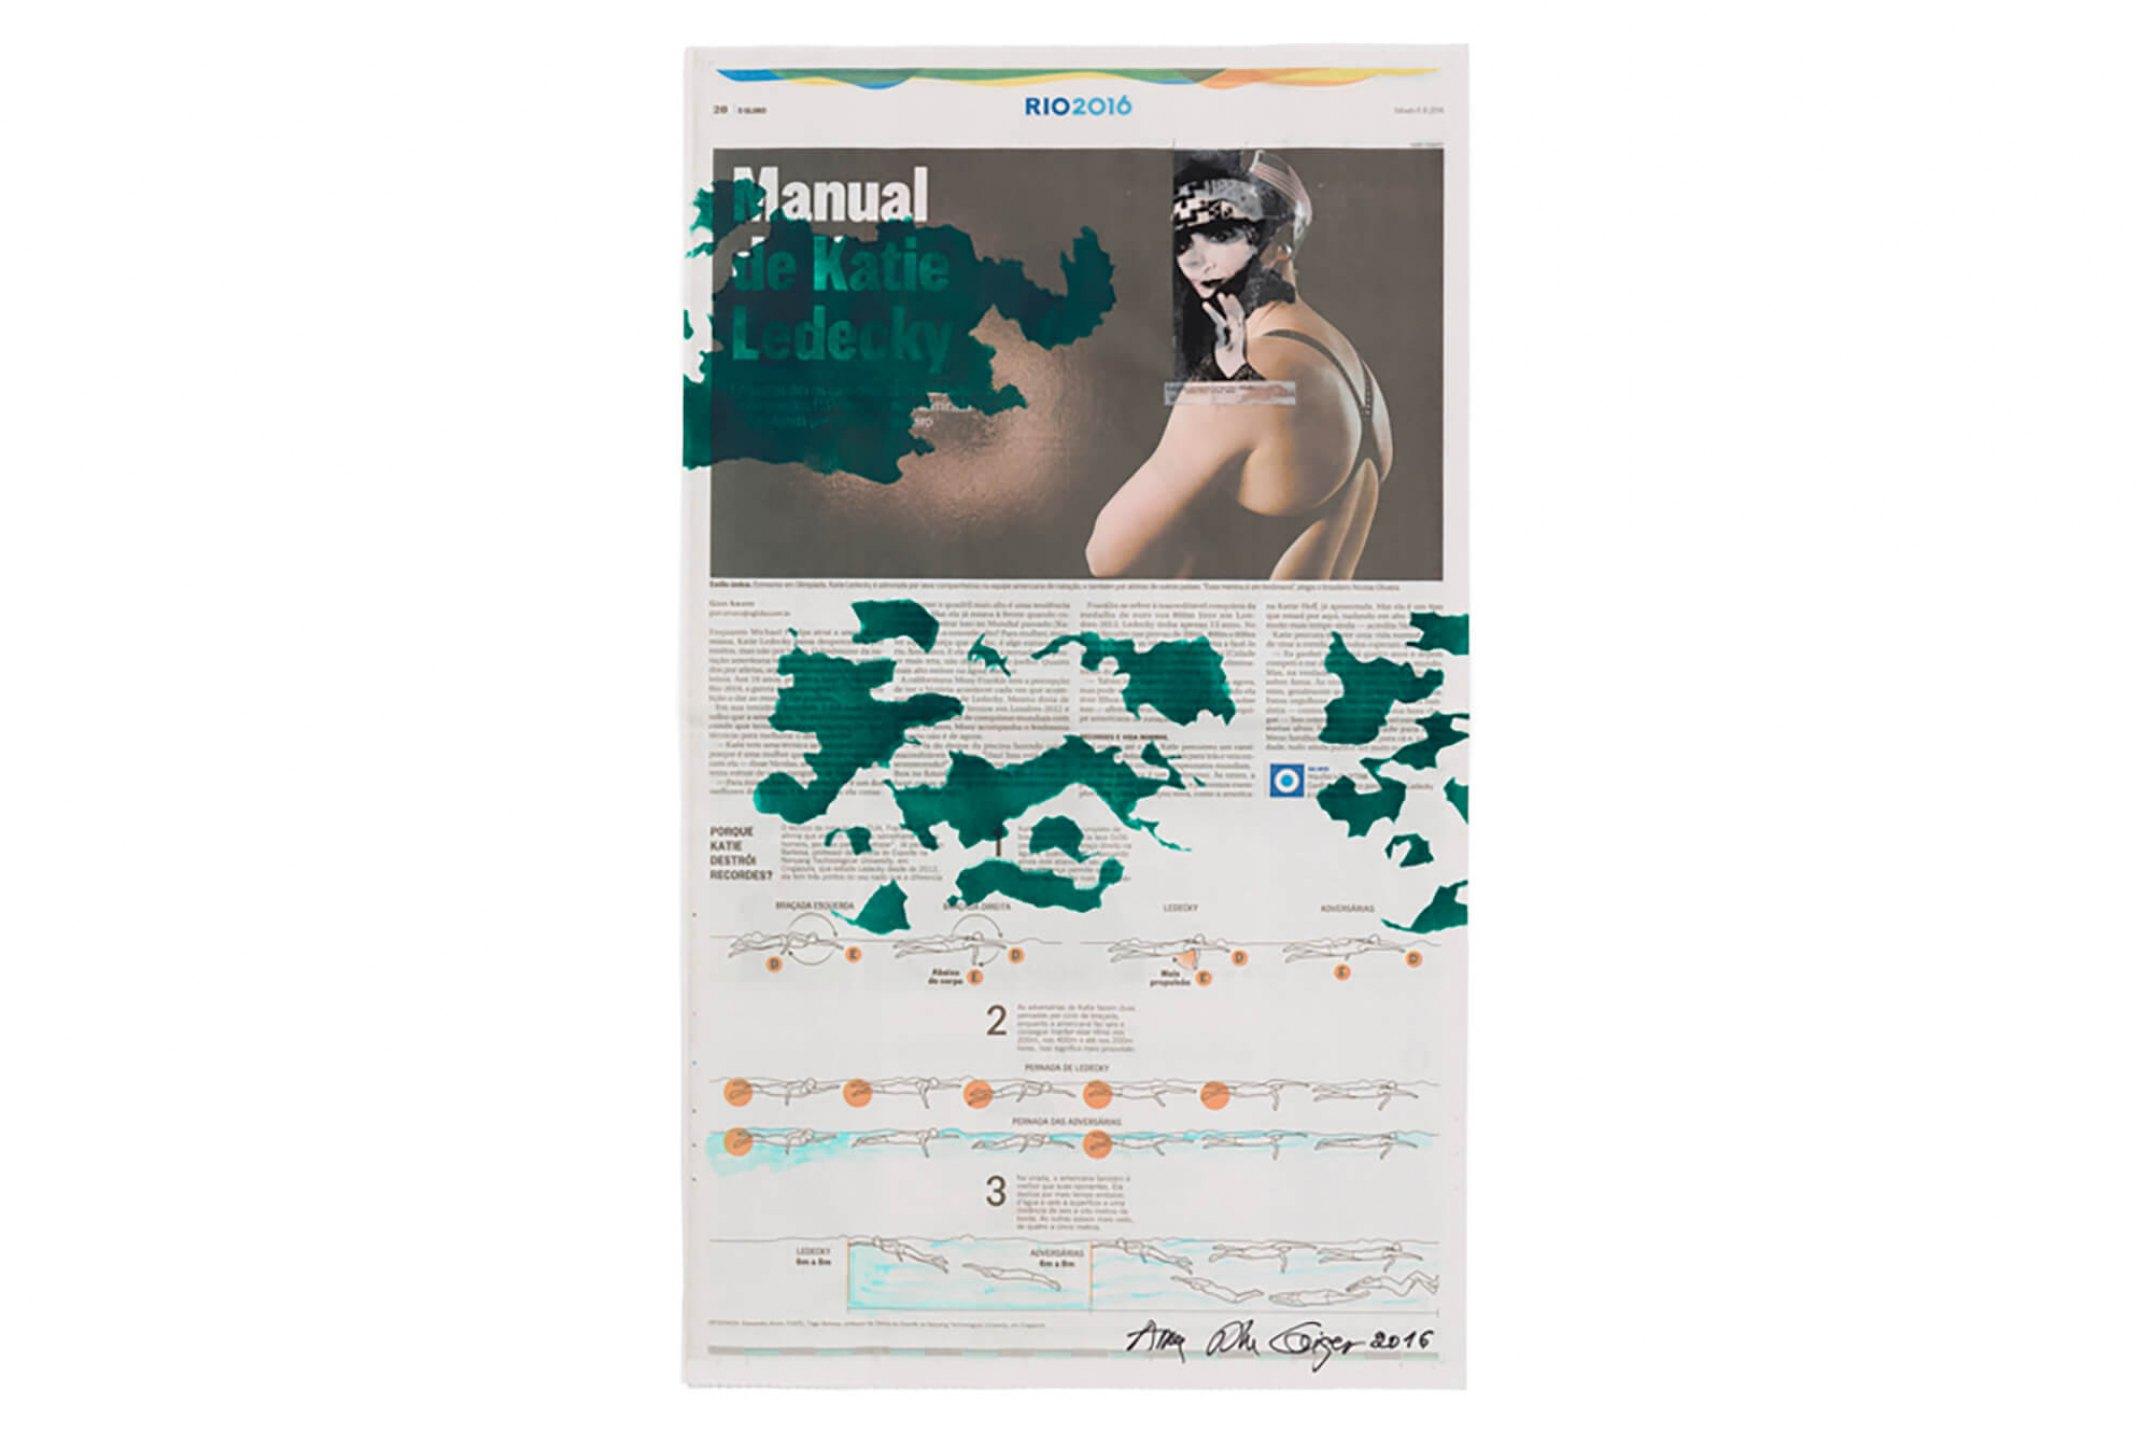 Anna Bella Geiger,<em>Rrose Sélavy, mesmo,</em>1997 – 2016, newspaper pages and screen printing, 54×32 cm - Mendes Wood DM